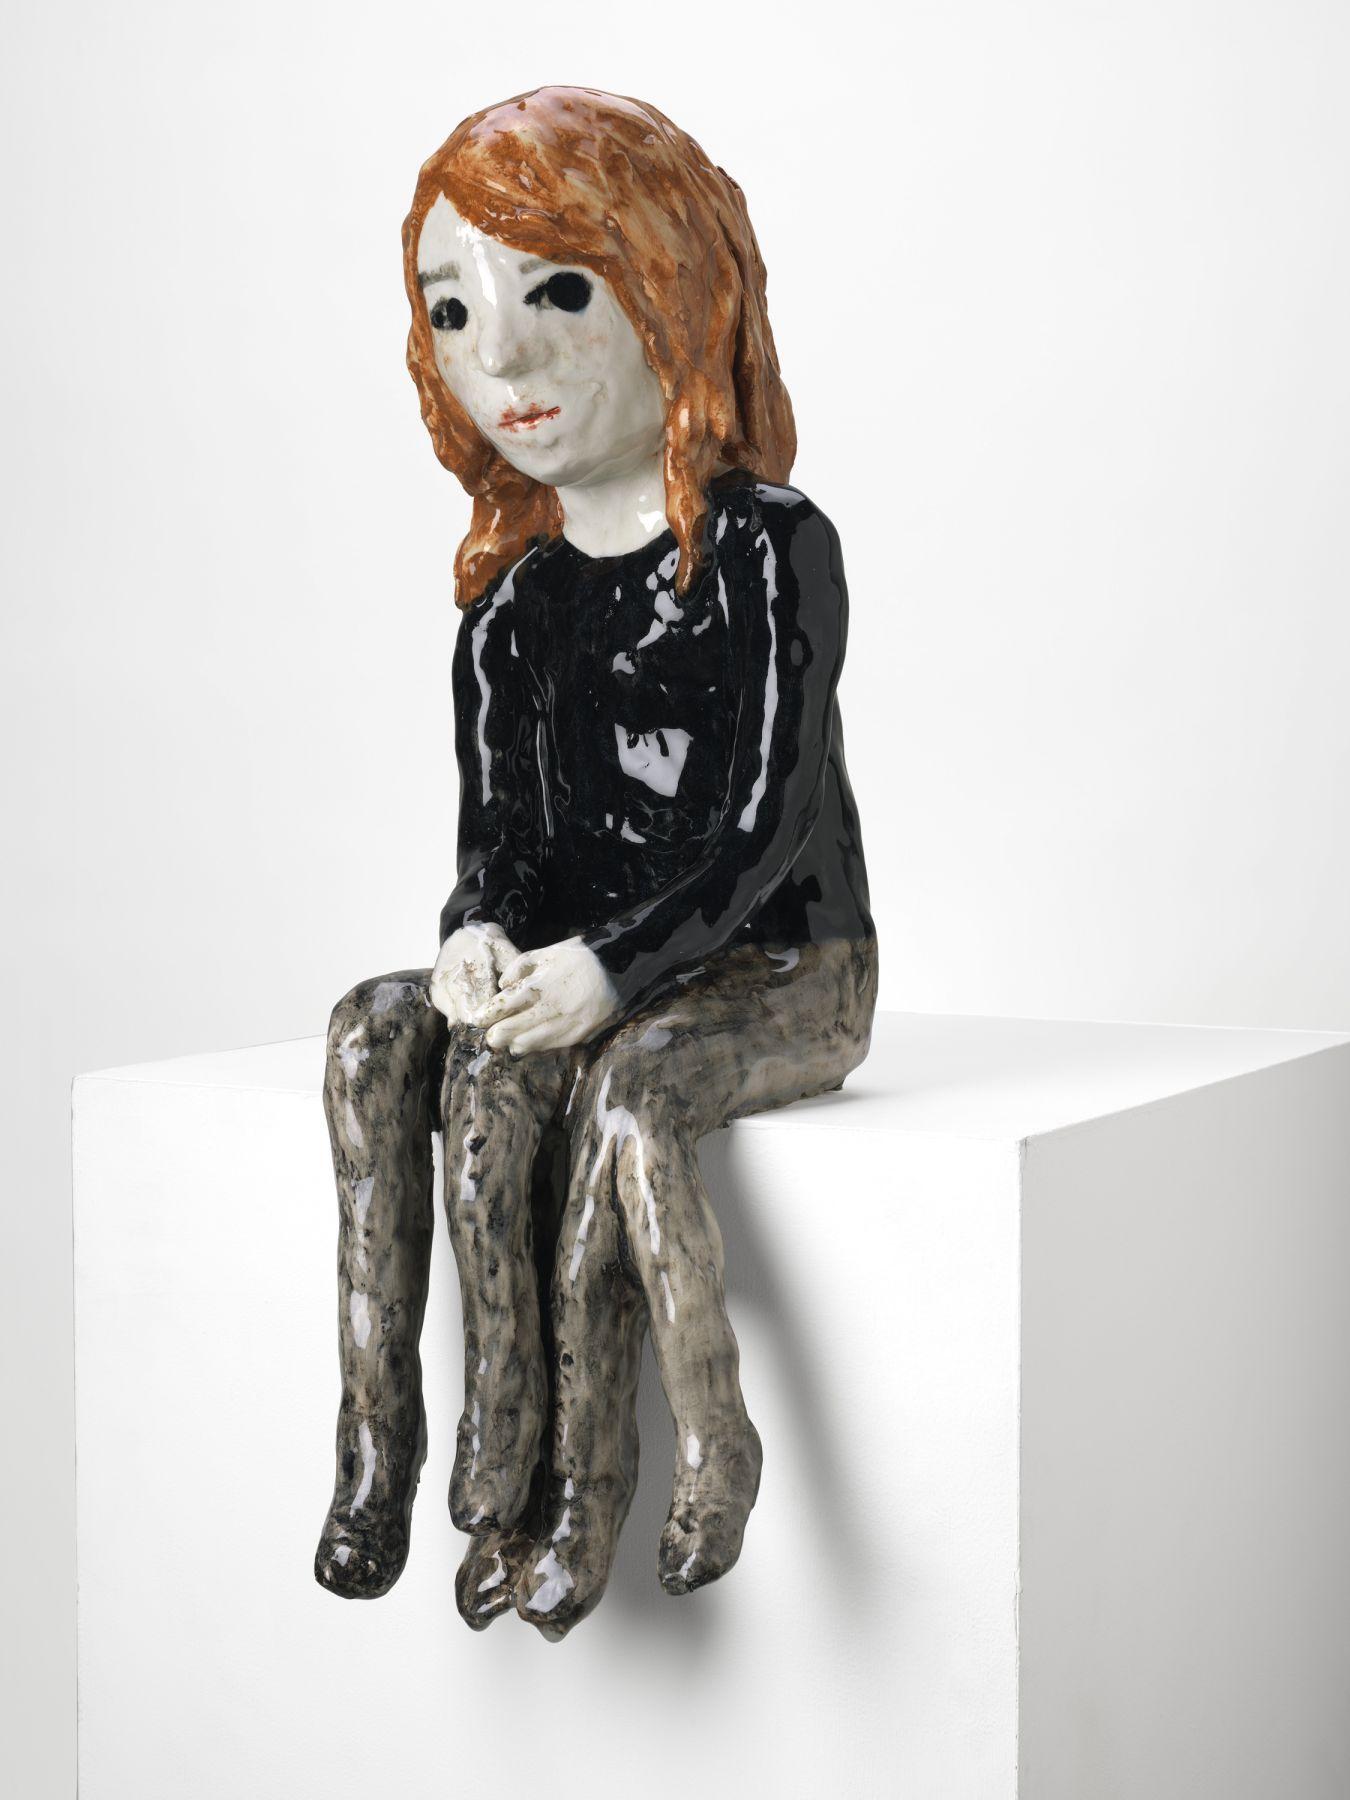 KLARA KRISTALOVA Some Kind of Monster, 2011